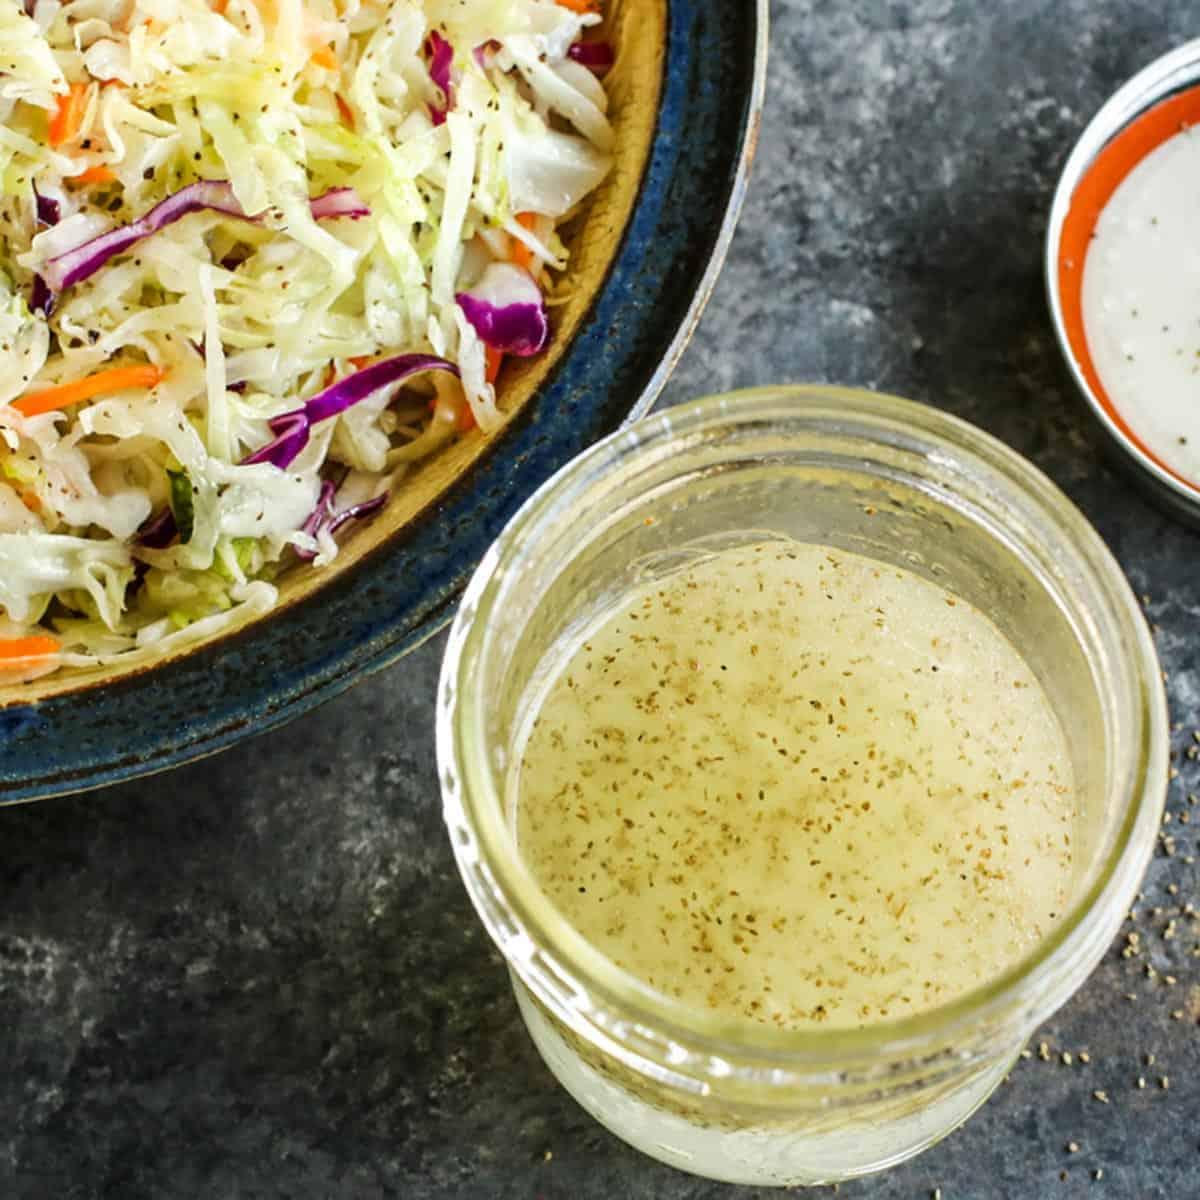 a jar of vinegar coleslaw dressing and a bowl of shredded cabbage